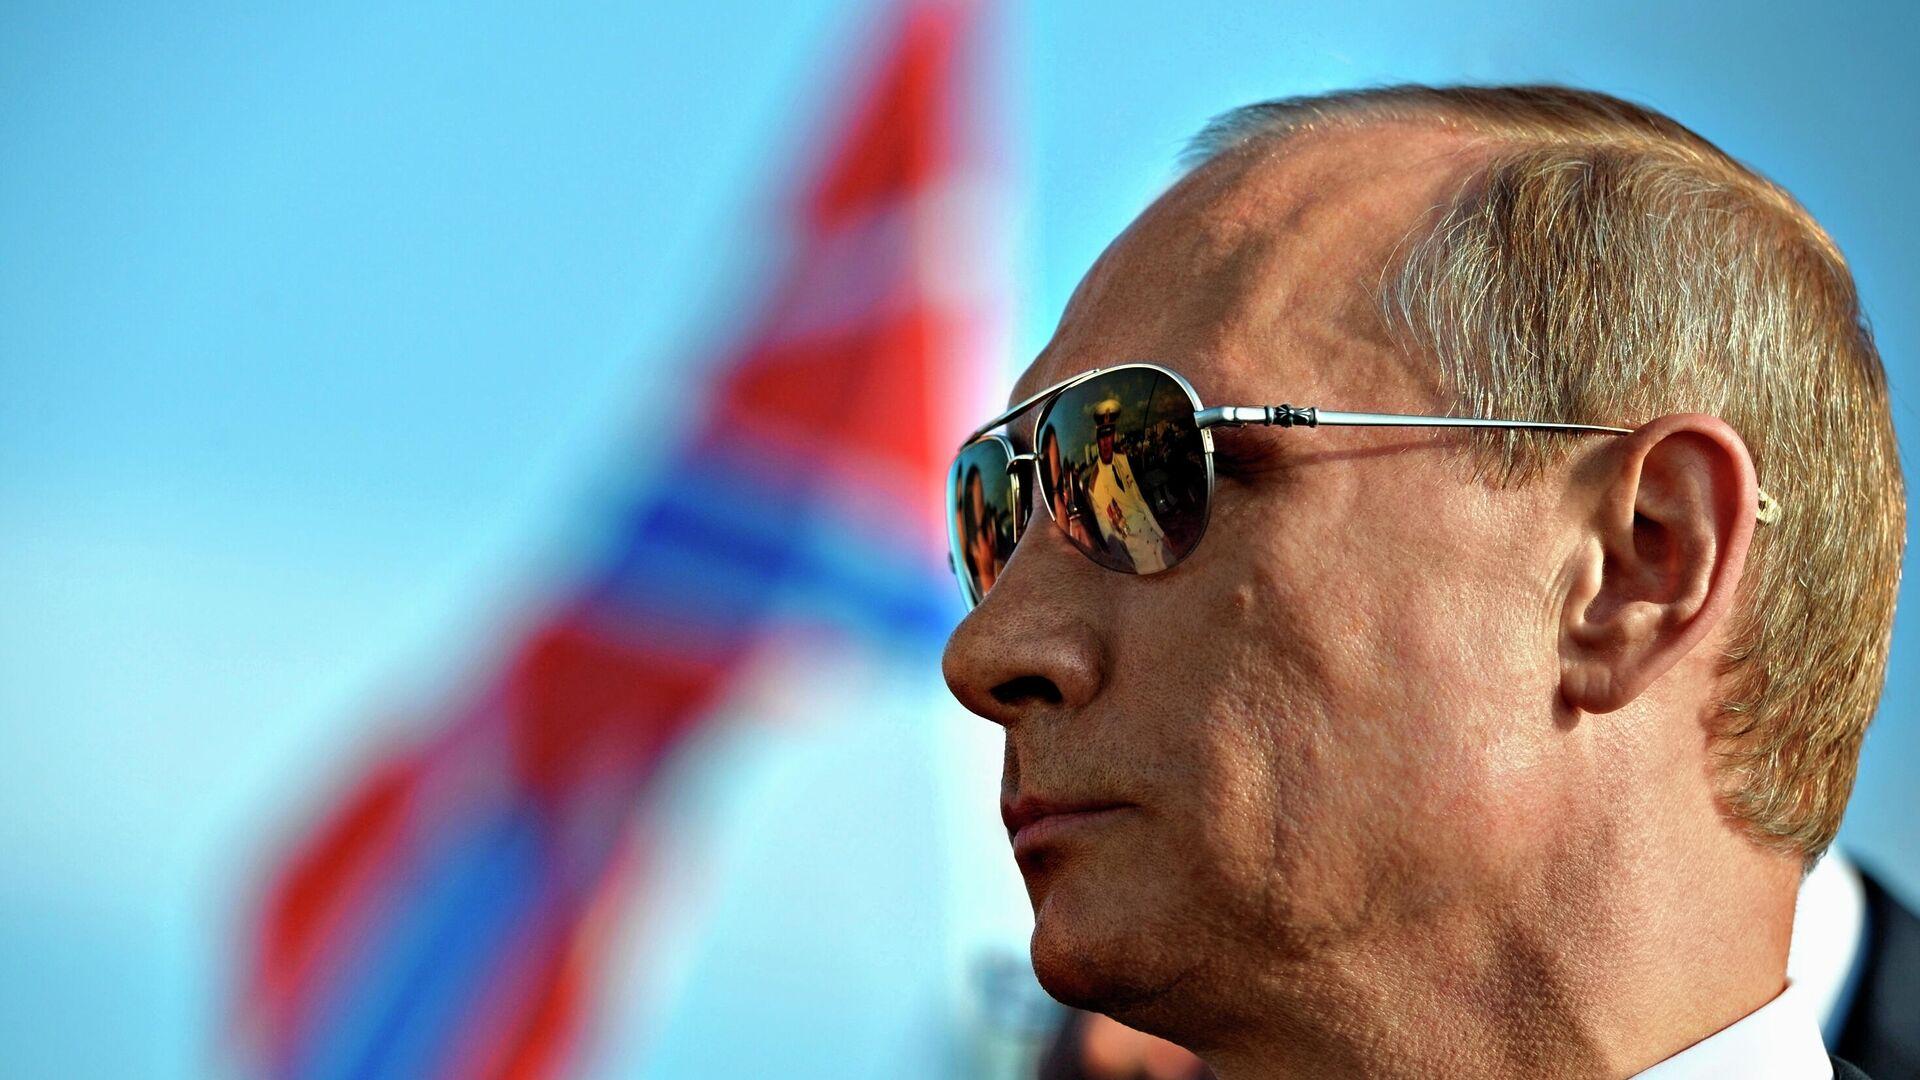 Президент России Владимир Путин - Sputnik Таджикистан, 1920, 14.10.2021